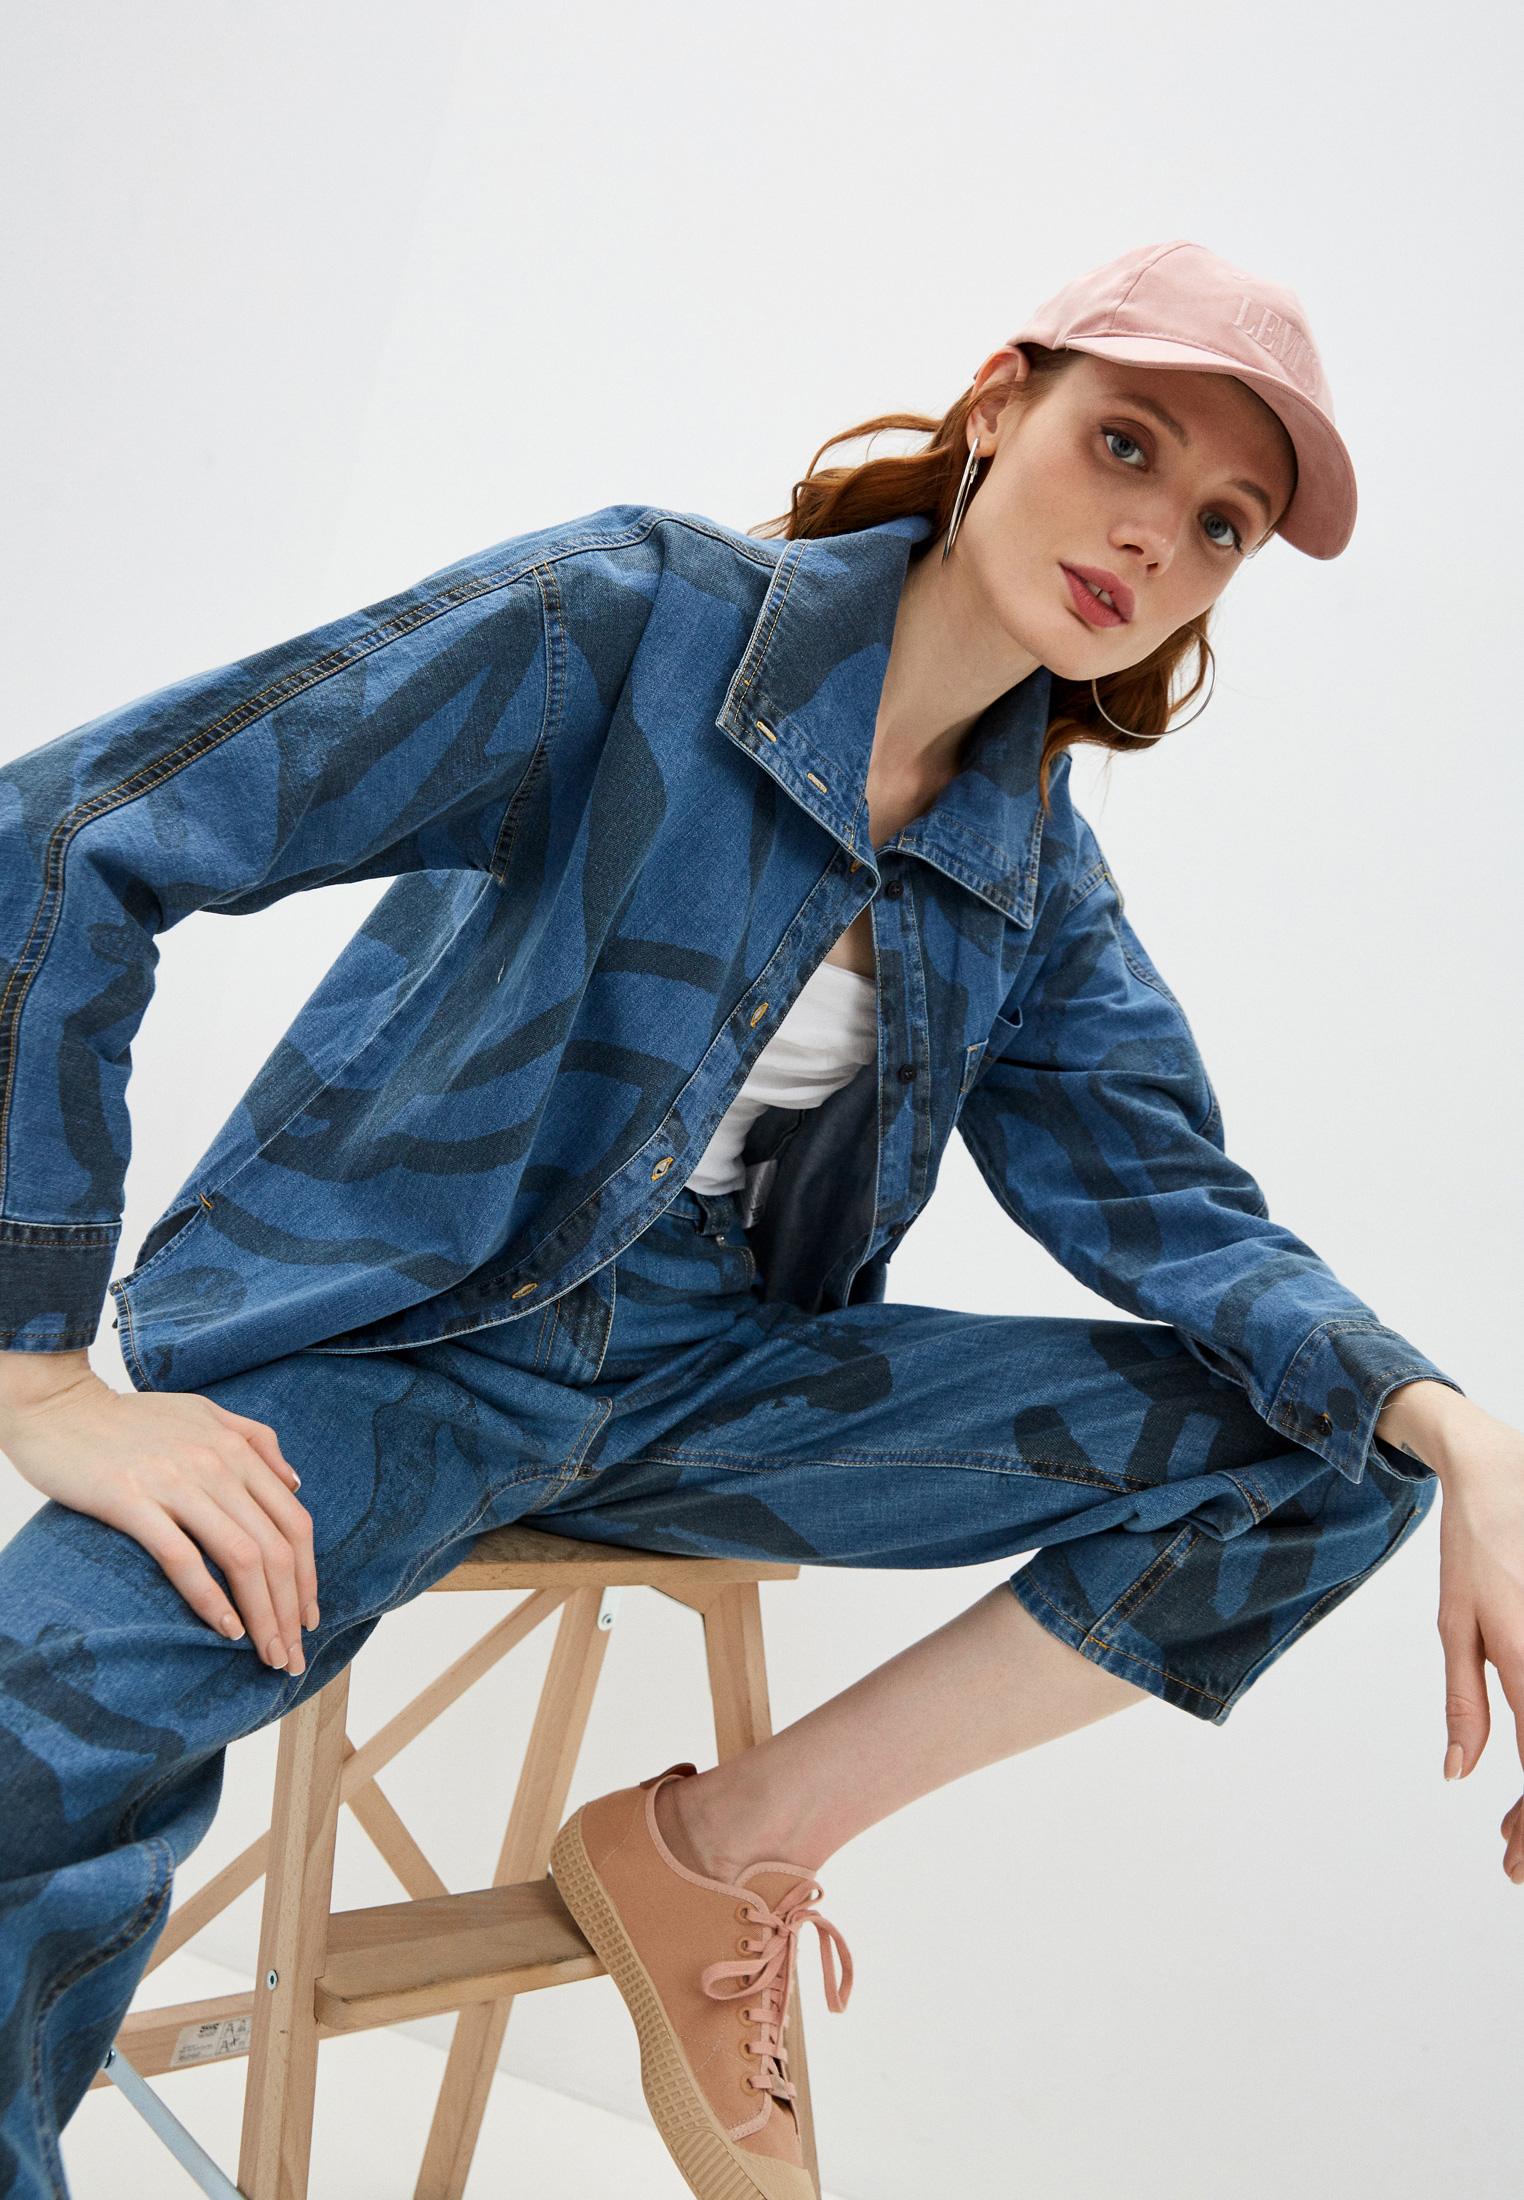 Женские джинсовые рубашки Kenzo (Кензо) Рубашка джинсовая Kenzo